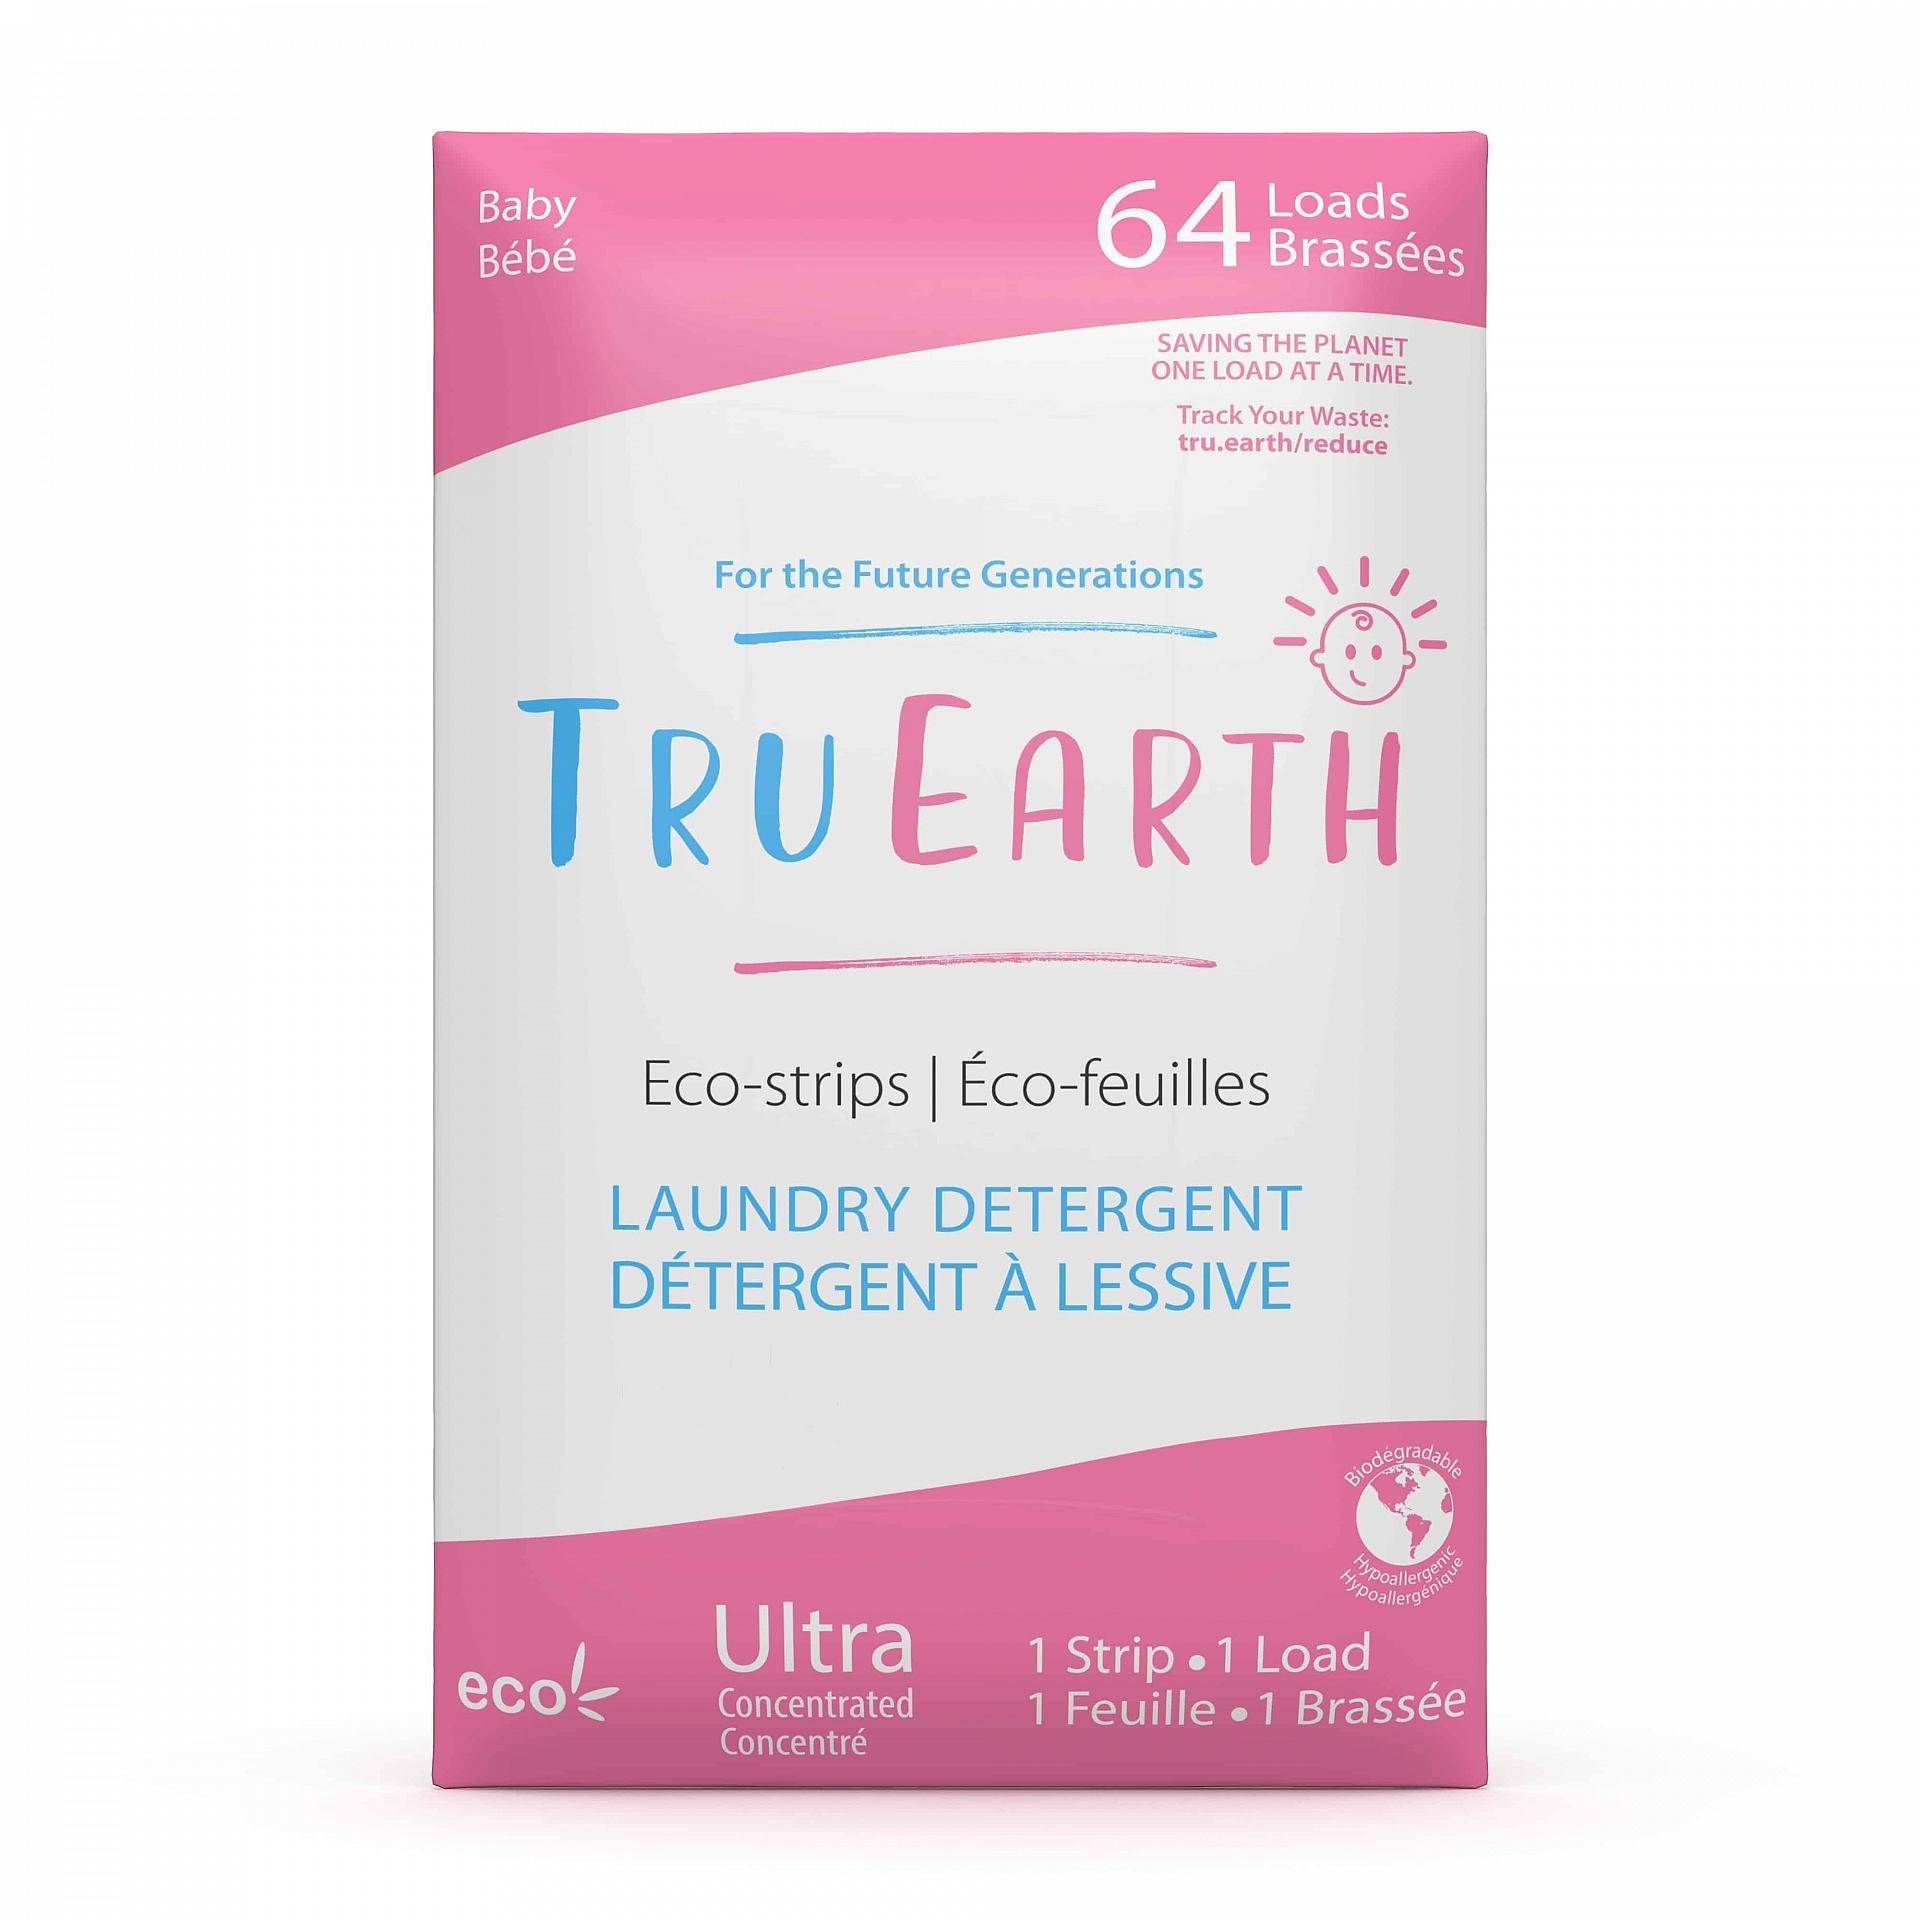 Tru_Earth_Eco_strips_Laundry_Detergent_Baby_64_Loads_1